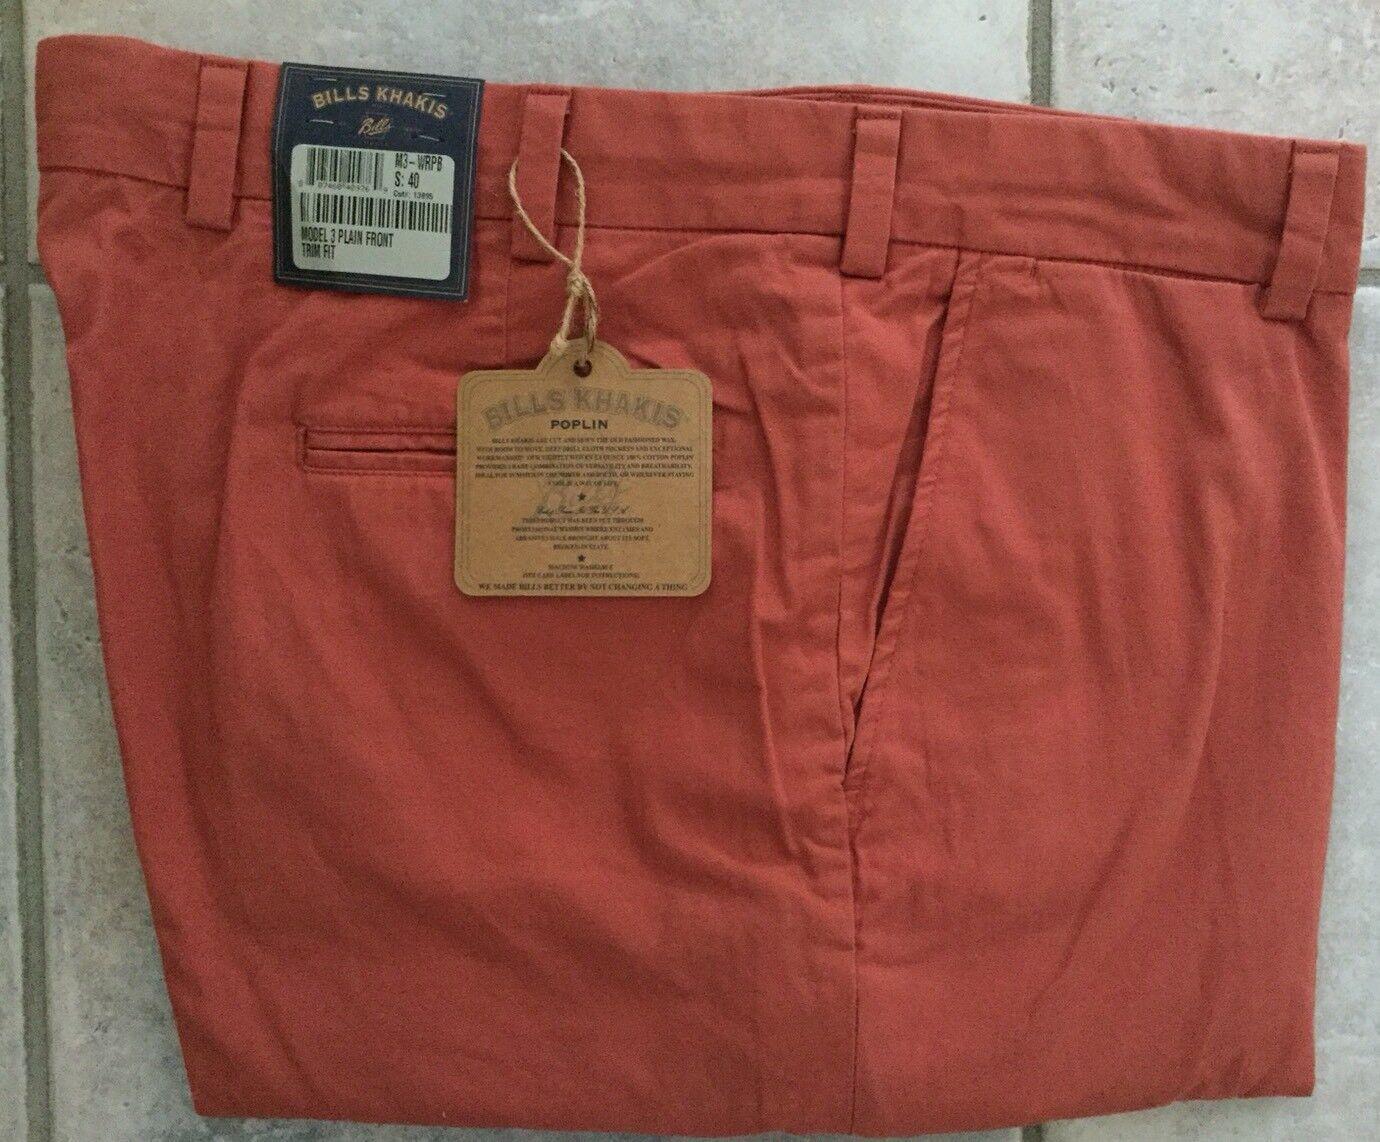 BRAND NEW-Bills khakis M3-WRPB Size 31 PLAIN TRIM WEATHERED RED POPLIN